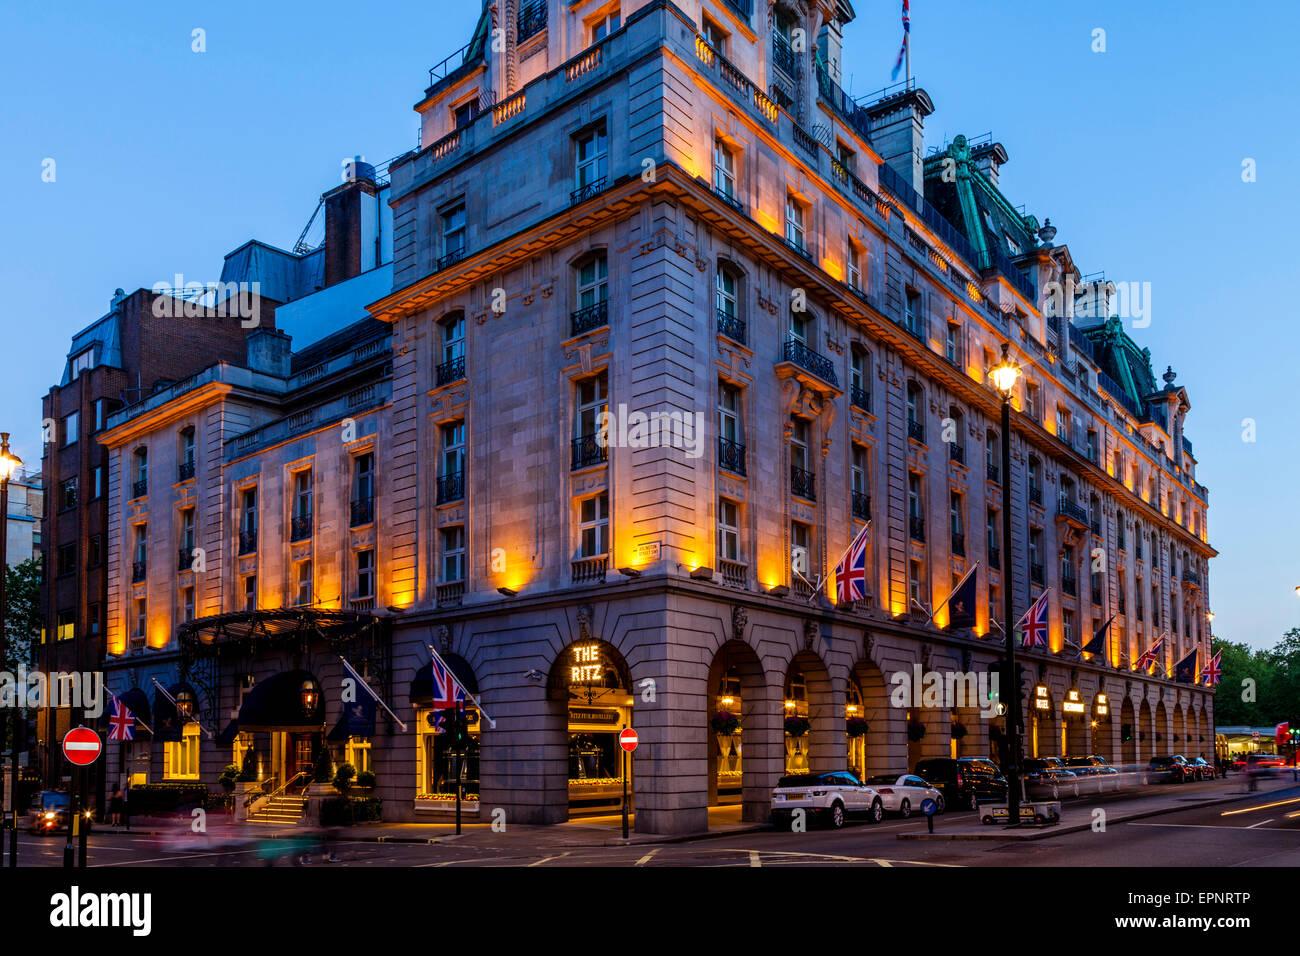 The Ritz Hotel At Night, London, England - Stock Image